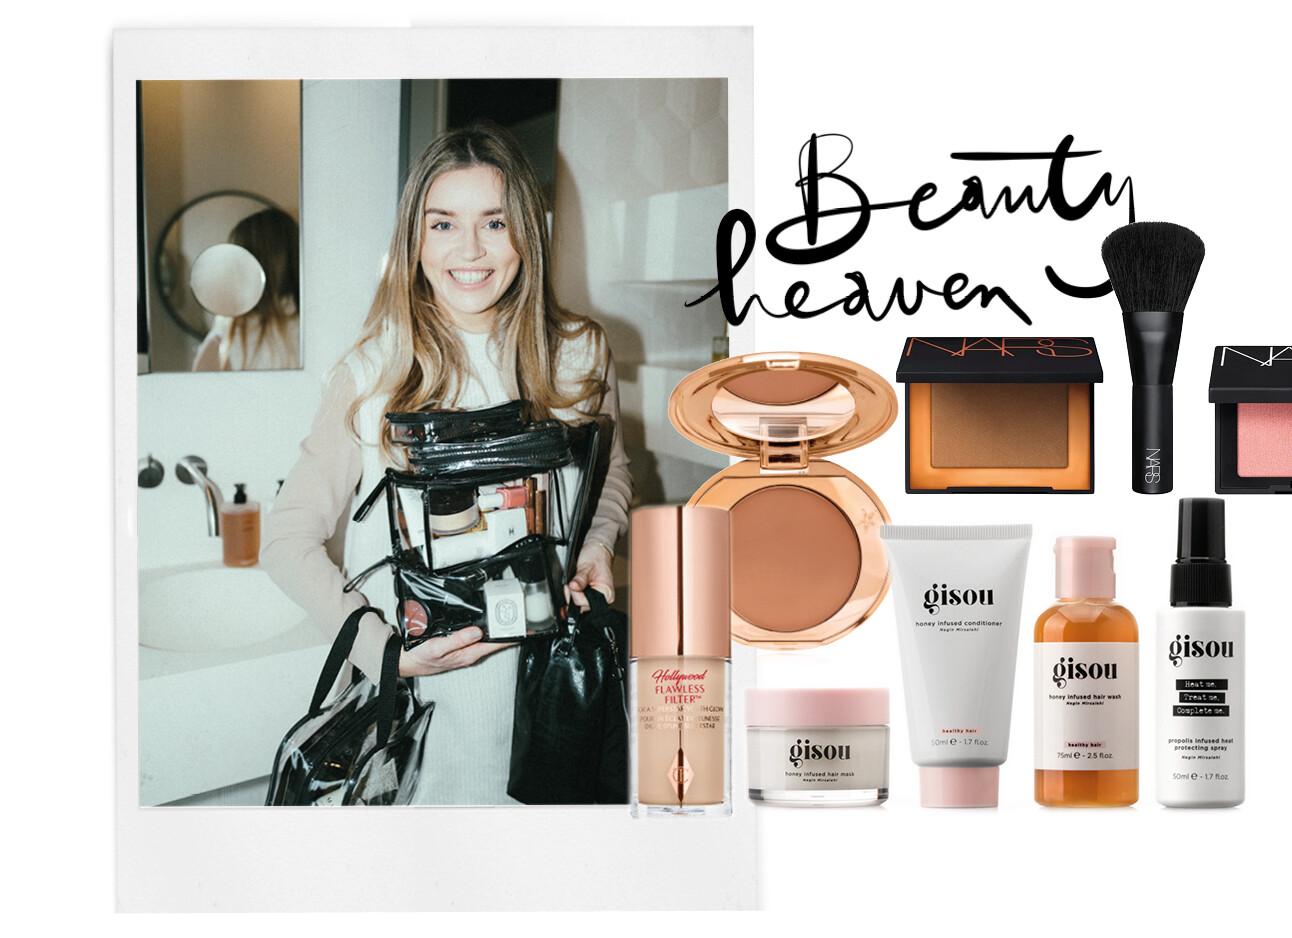 lotte lachend met make-up tassen beauty APK mini's travel size makeup